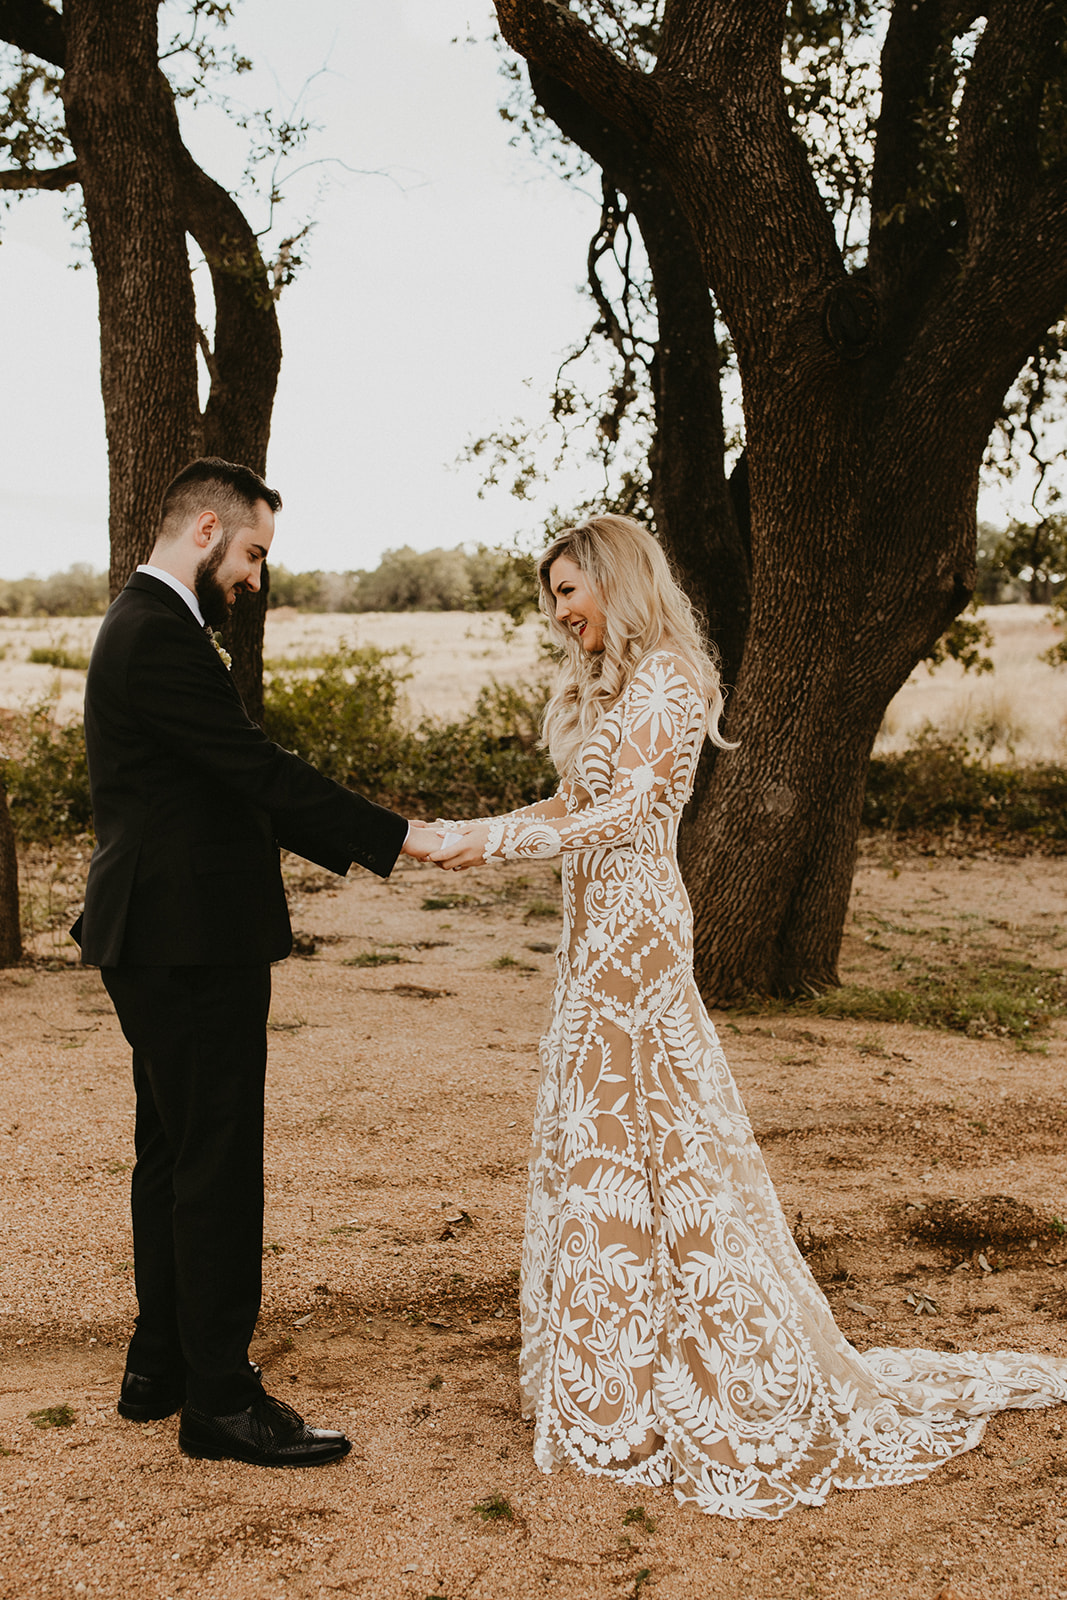 Epoch Co+ | Bride + Groom First Look | Austin Wedding Venue Prospect House | Groom Attire + Floral Tie + Hops Boutonnière + Bridal Dress Rue De Seine Nude Underskirt  + Bridal Hairstyle | Austin Wedding Planner